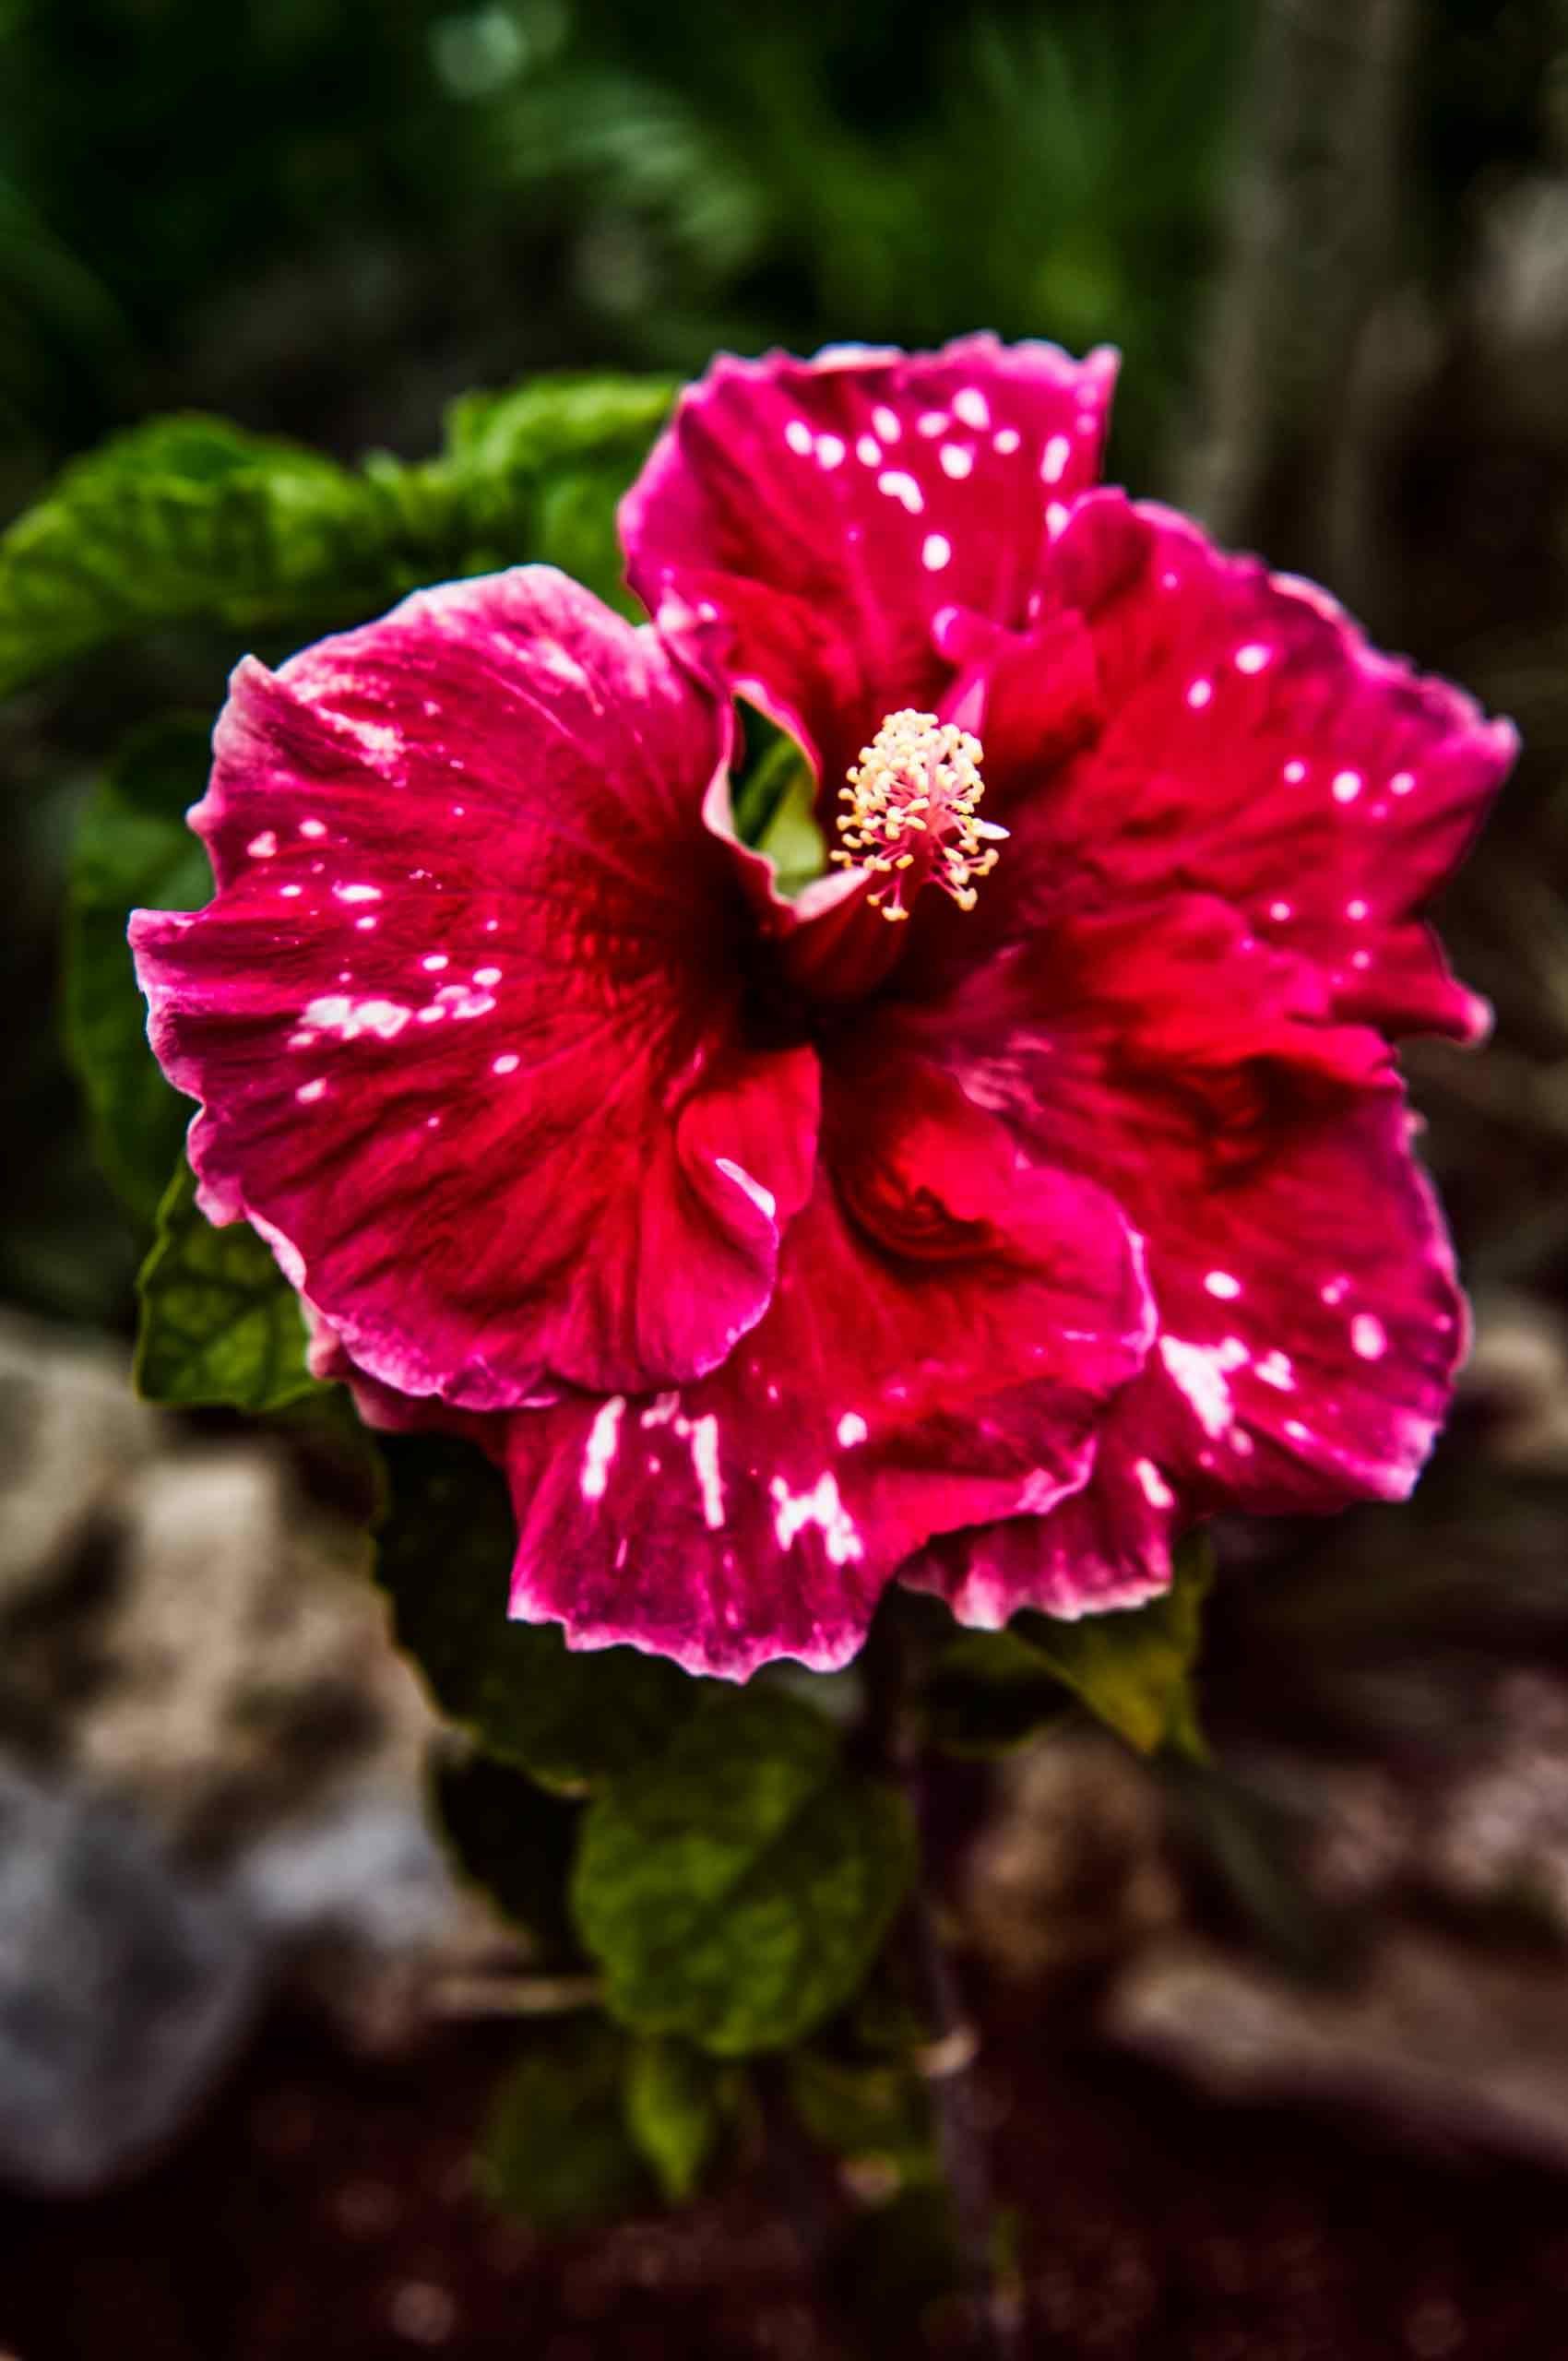 Flower-Red-Pistil-Mexico-by-HenrikOlundPhotography.jpg